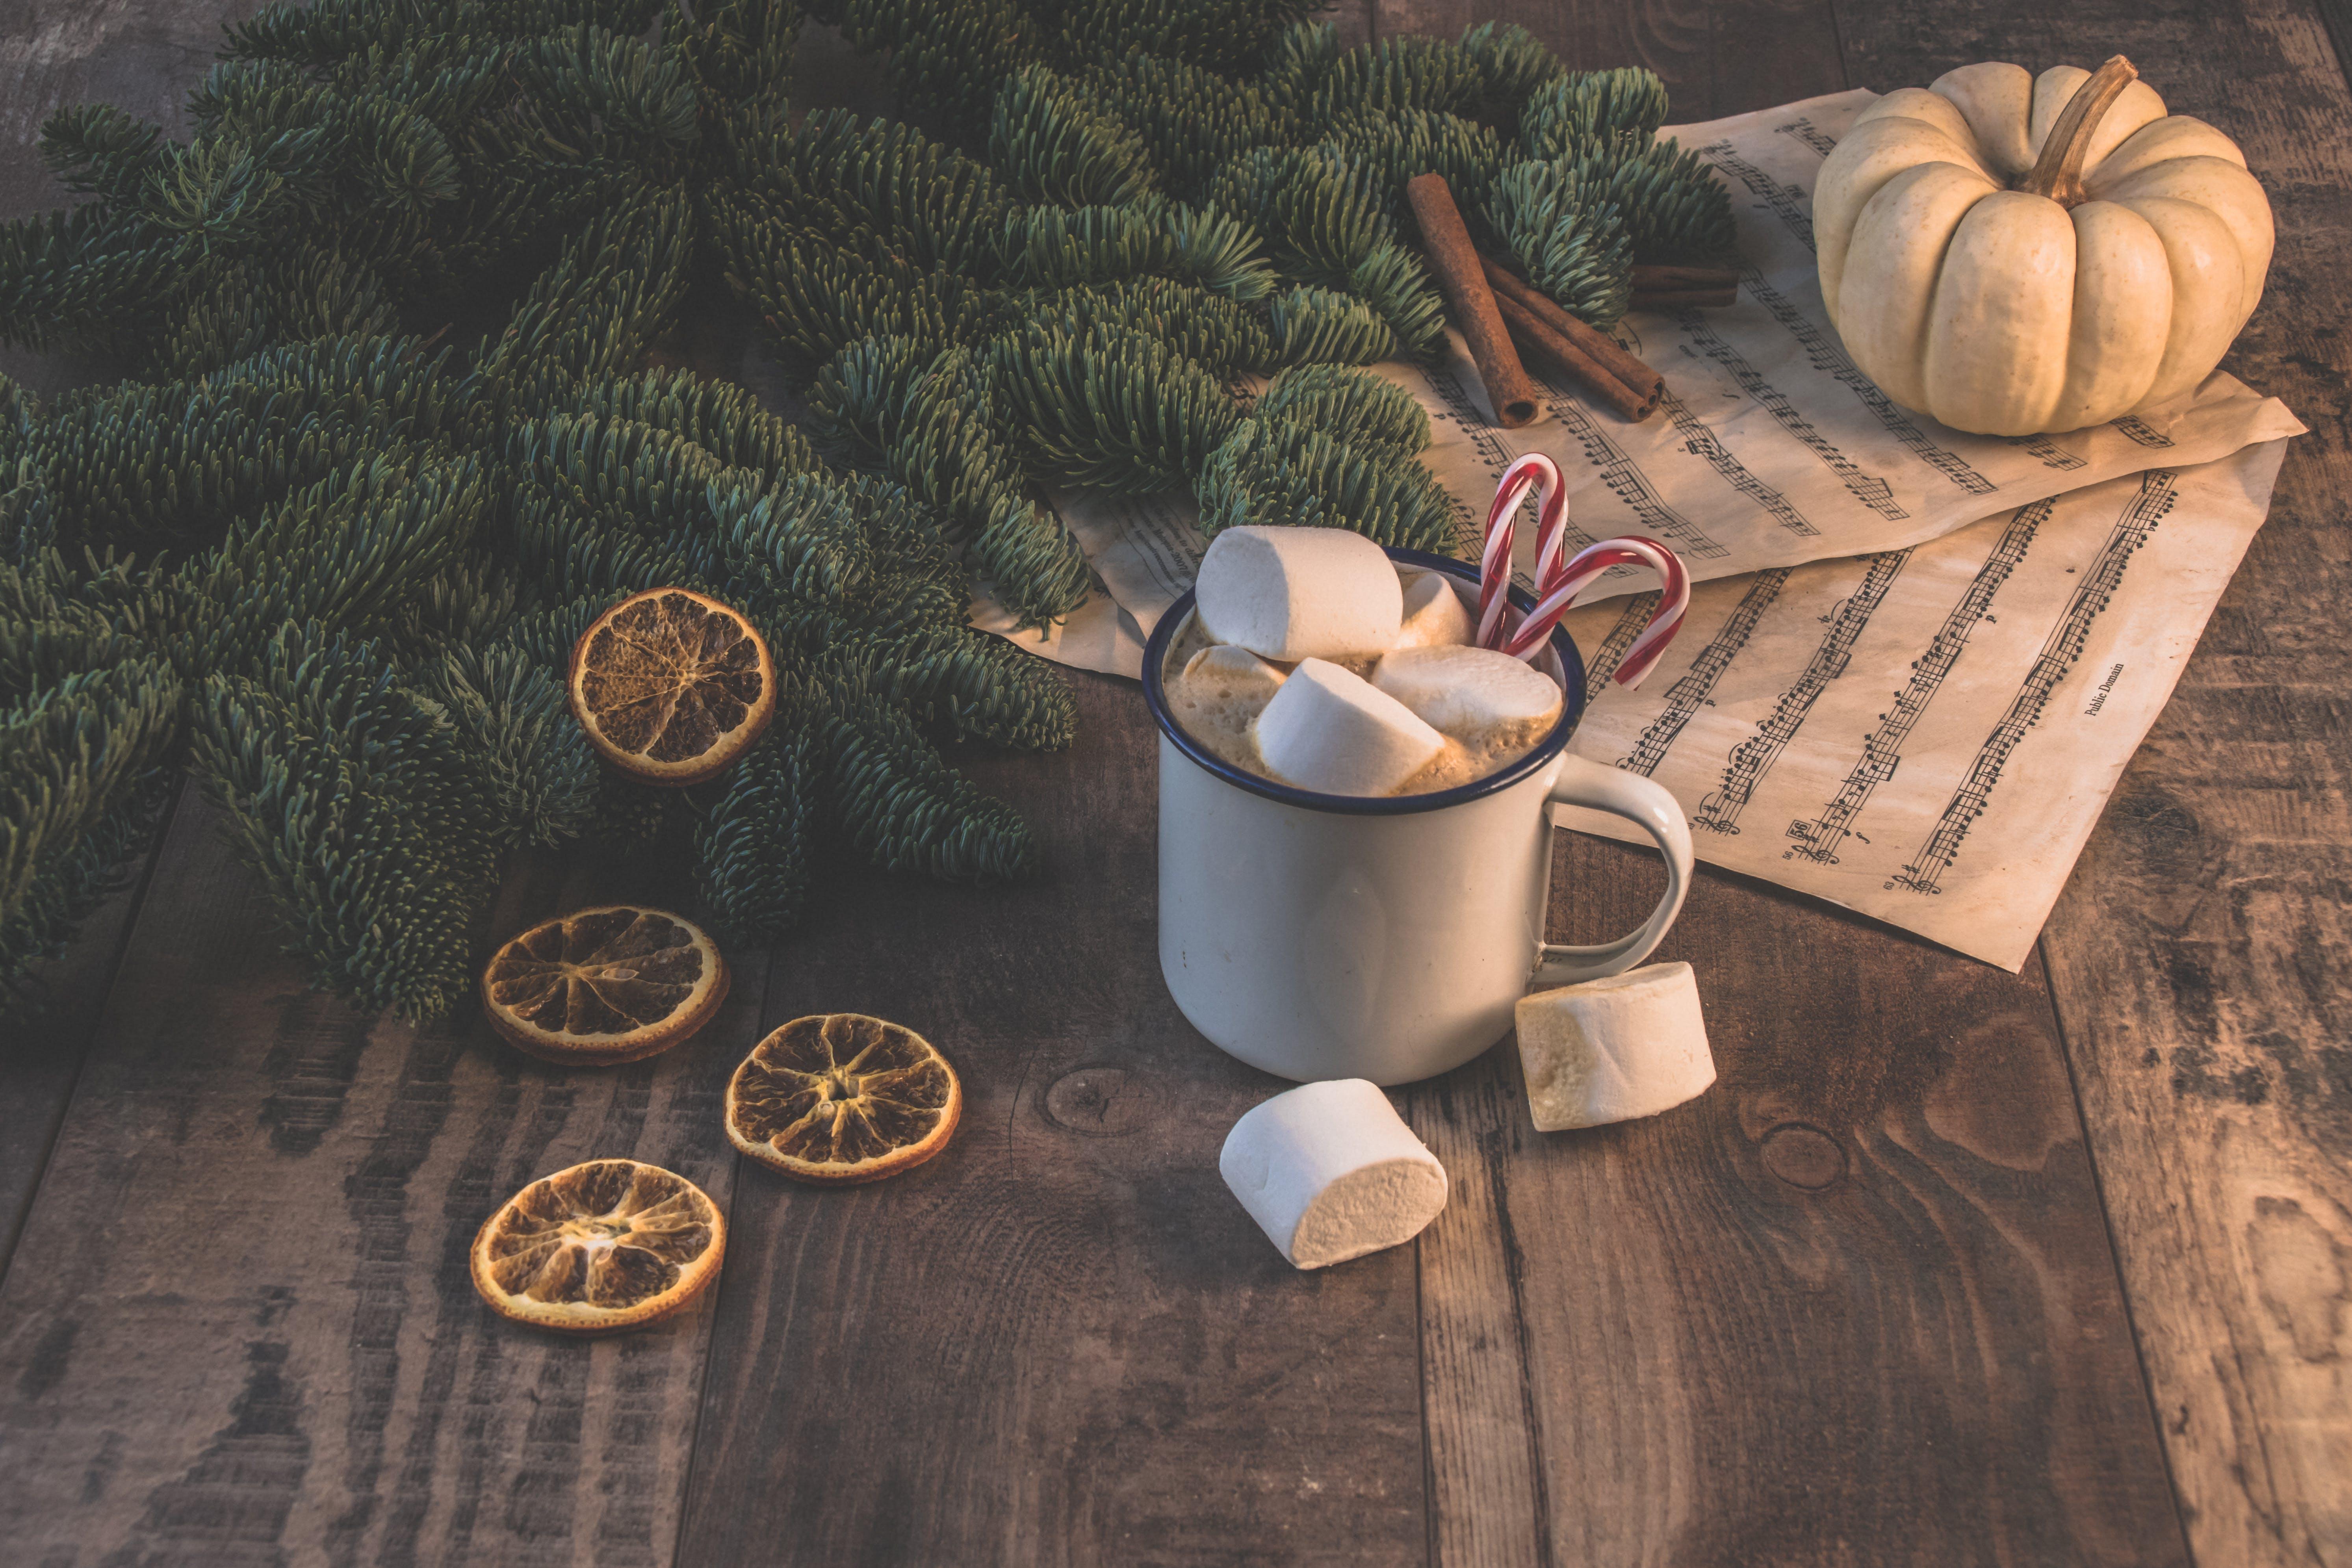 White Ceramic Mug With Coffee and Marshmallows Near Pinetree